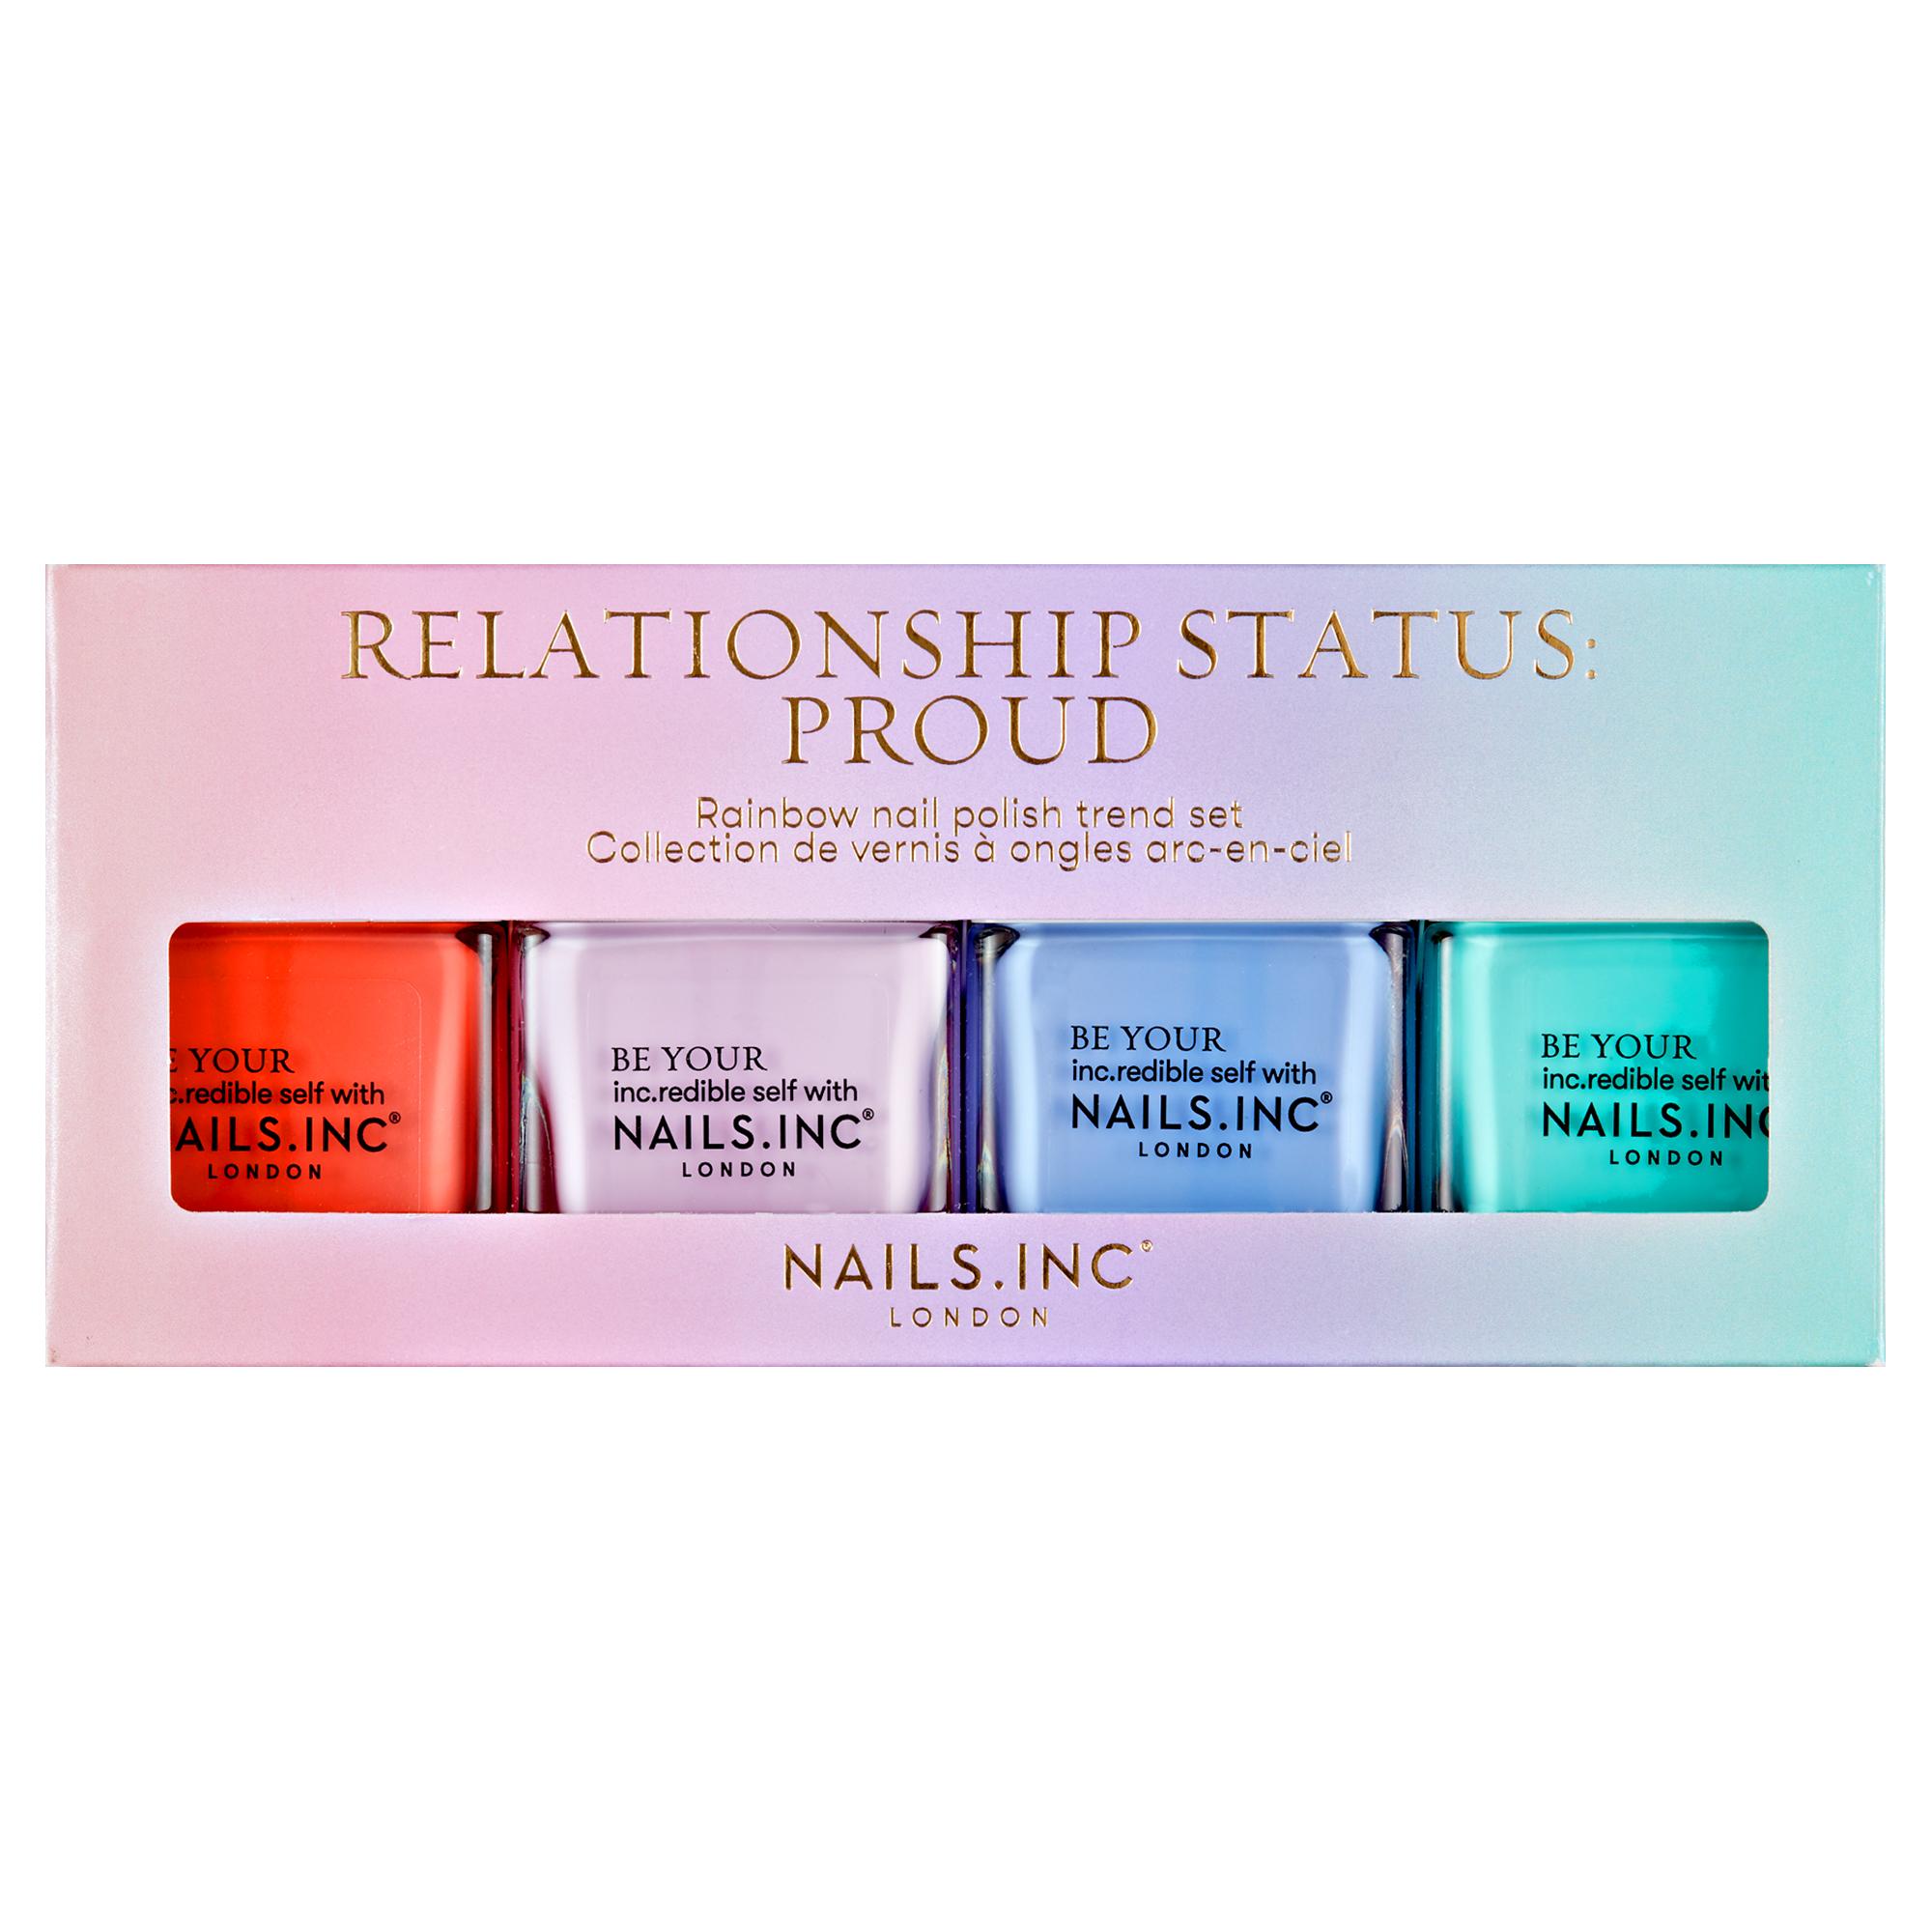 RELATIONSHIP STATUS: PROUD 4 PIECE NAIL POLISH SET